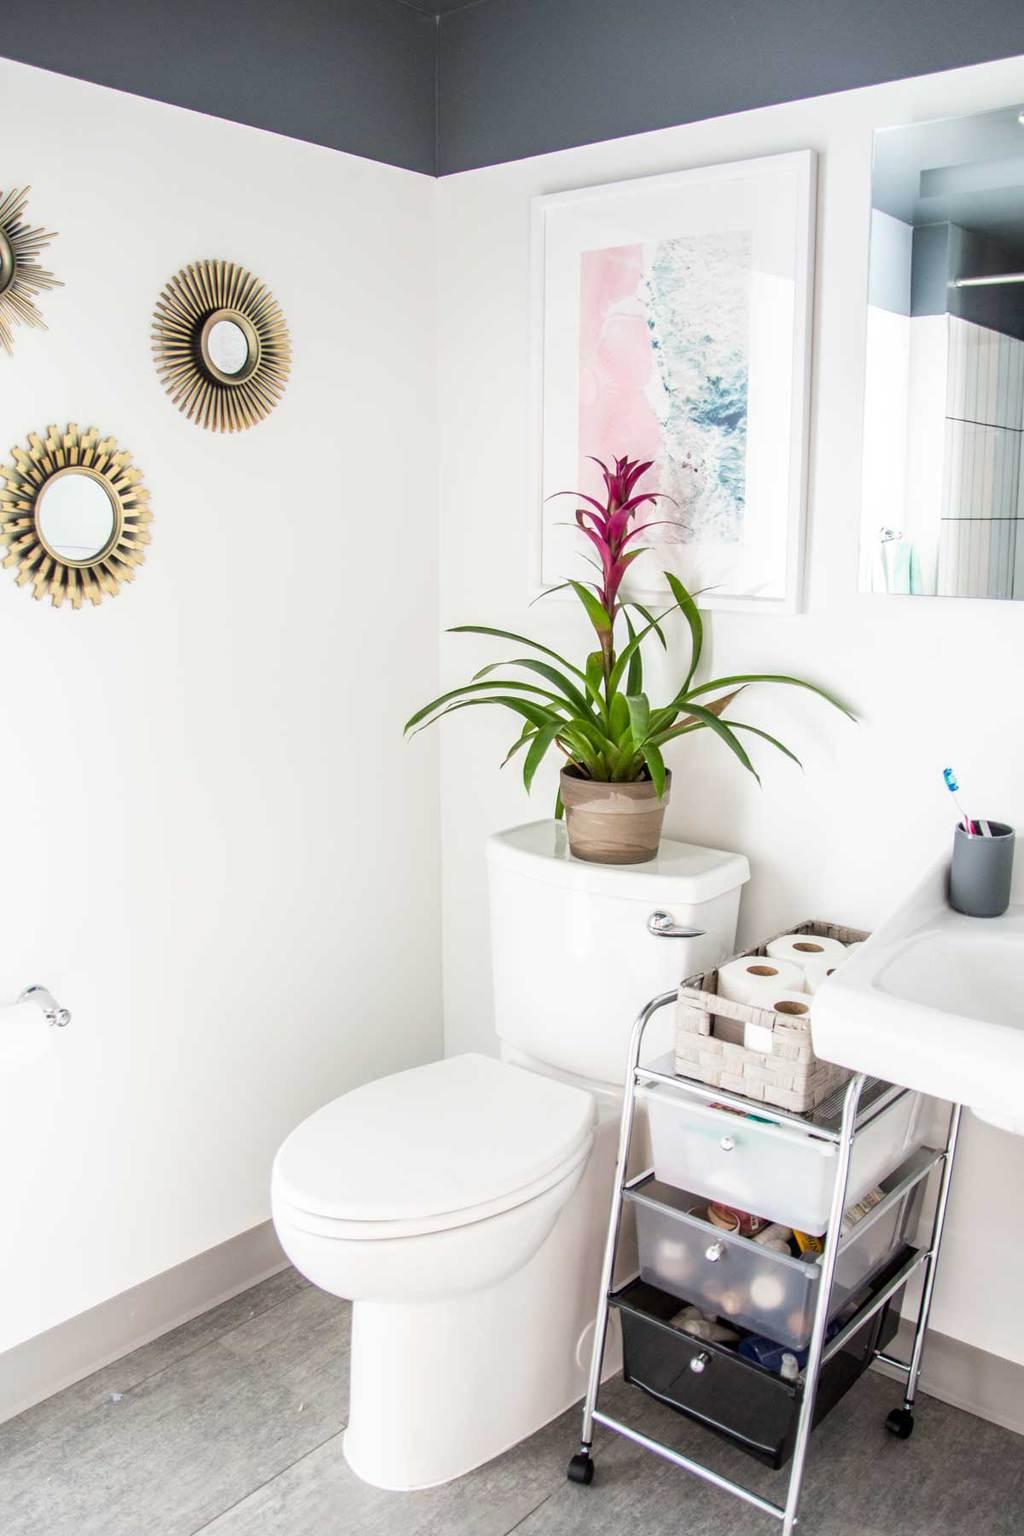 Updating & Organizing an Apartment Bathroom - Thou Swell on Apartment Bathroom  id=18023